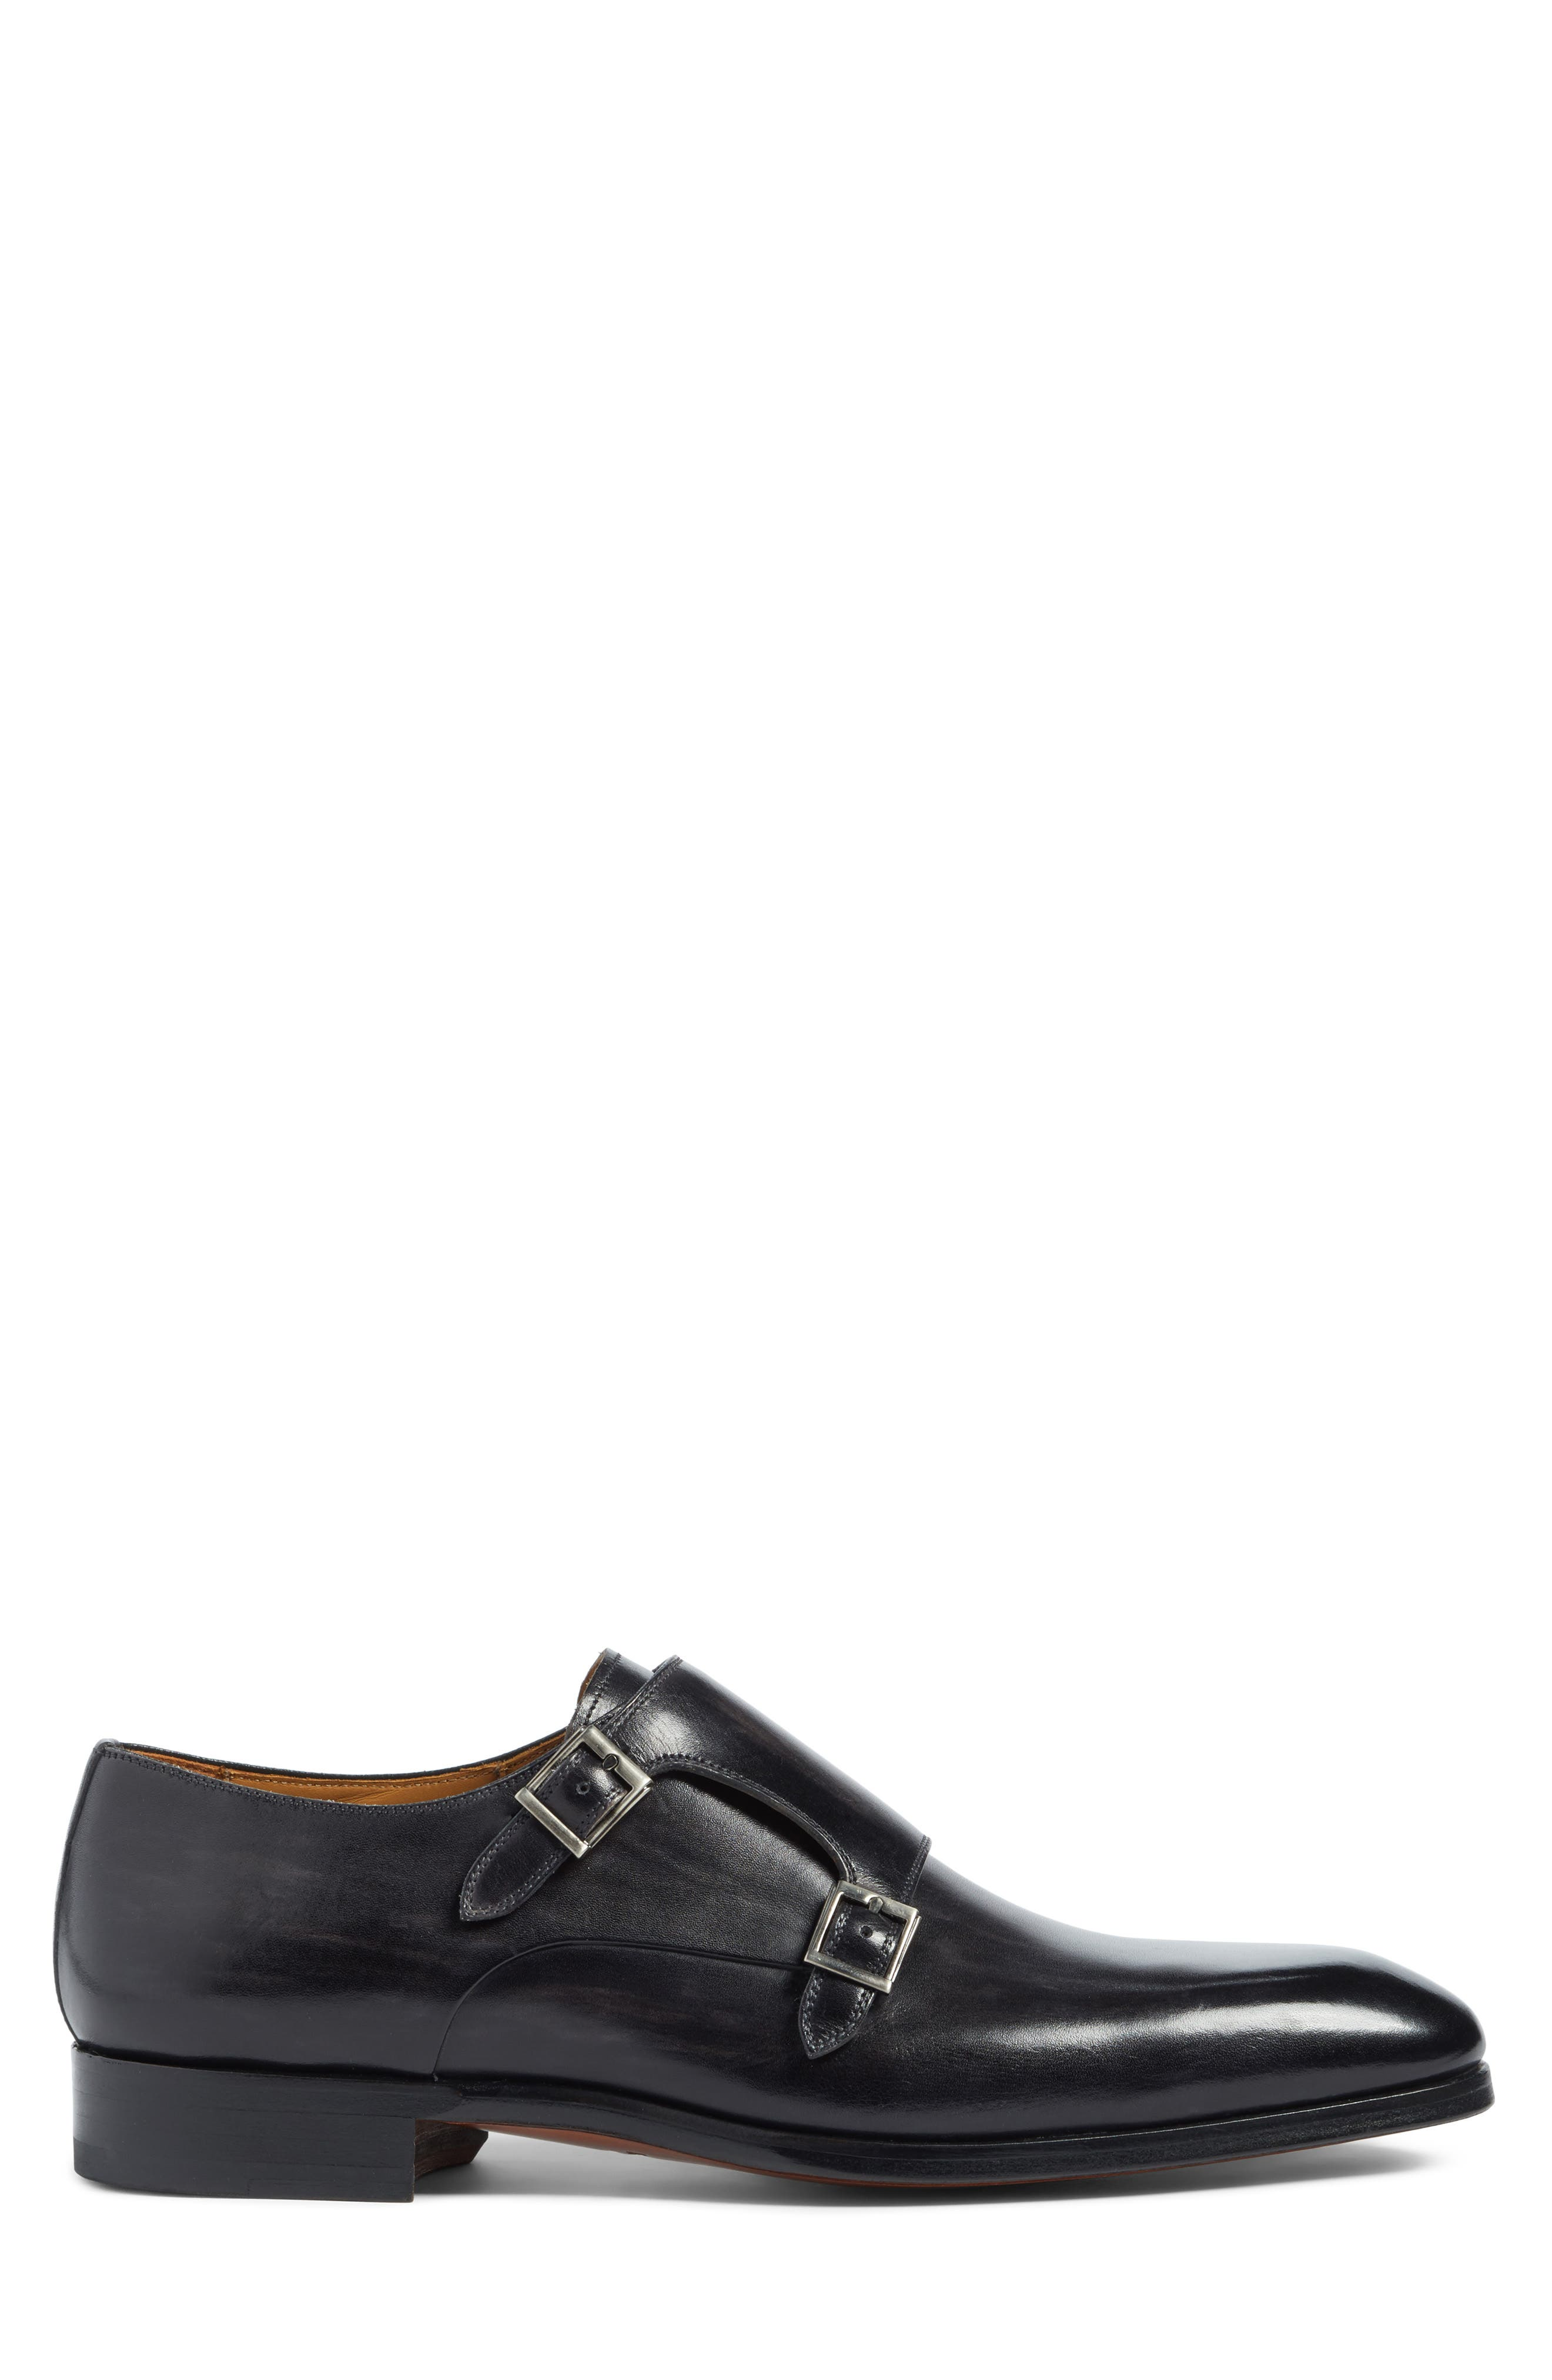 Lucio Double Strap Monk Shoe,                             Alternate thumbnail 3, color,                             Light Grey Leather